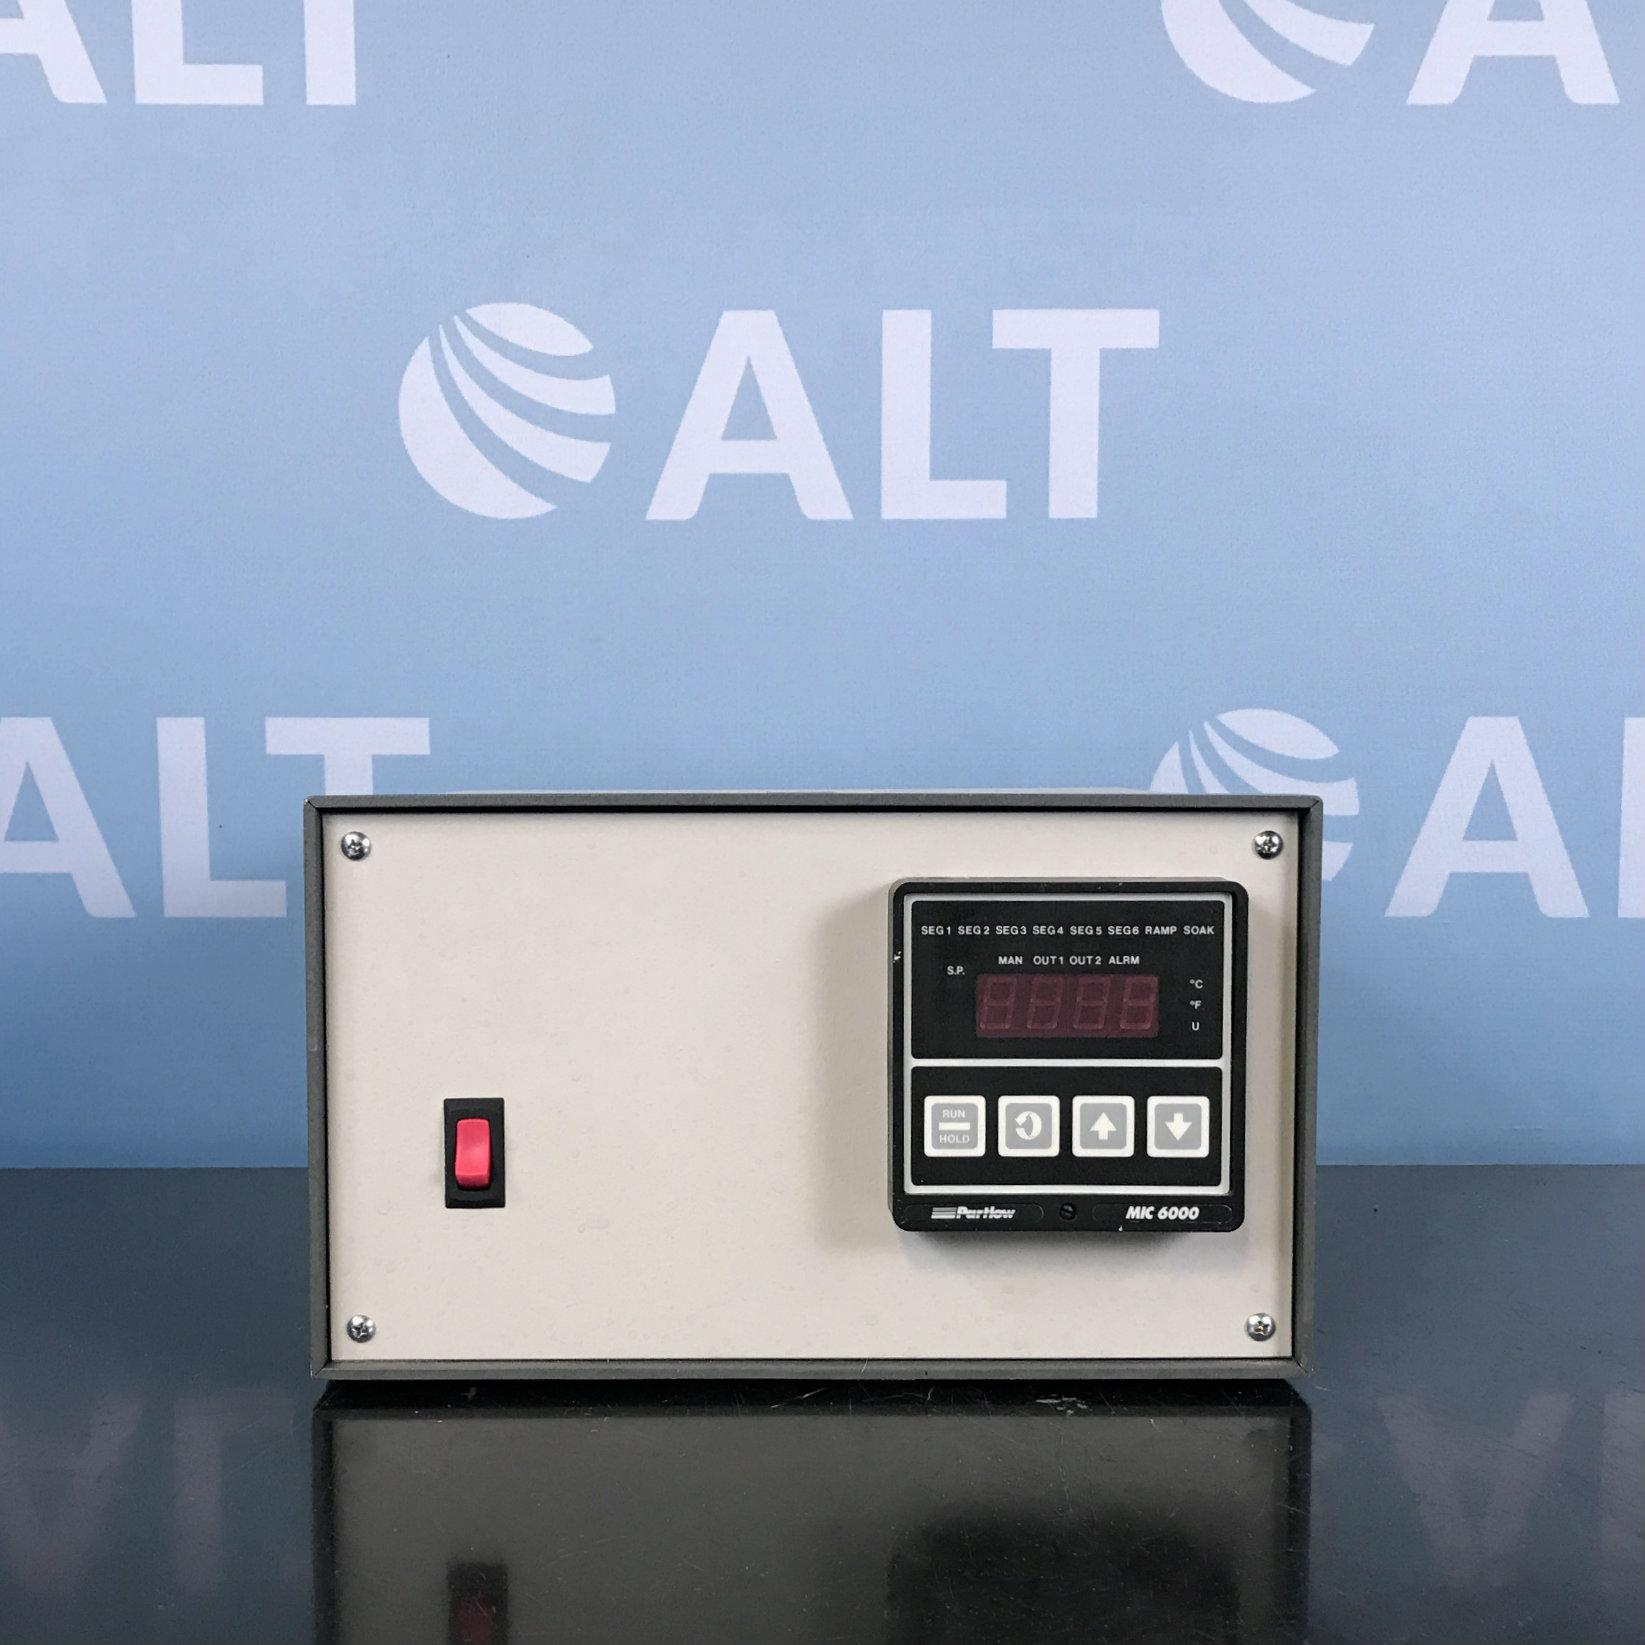 Partlow MIC-6000 Profile Temperature Process Controller Image